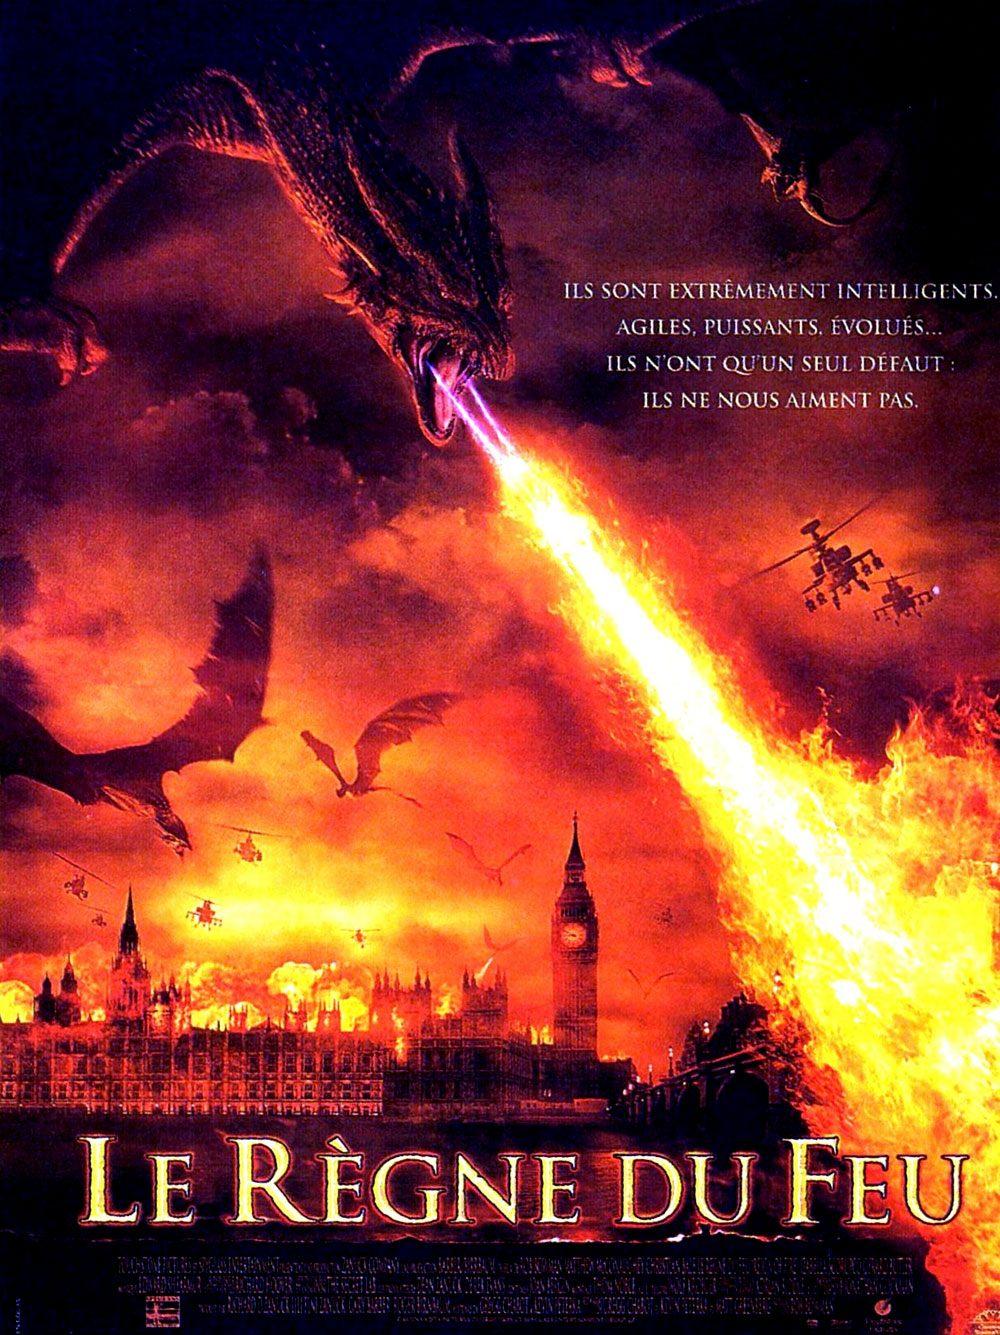 Affiche Poster règne feu reign fire disney touchstone